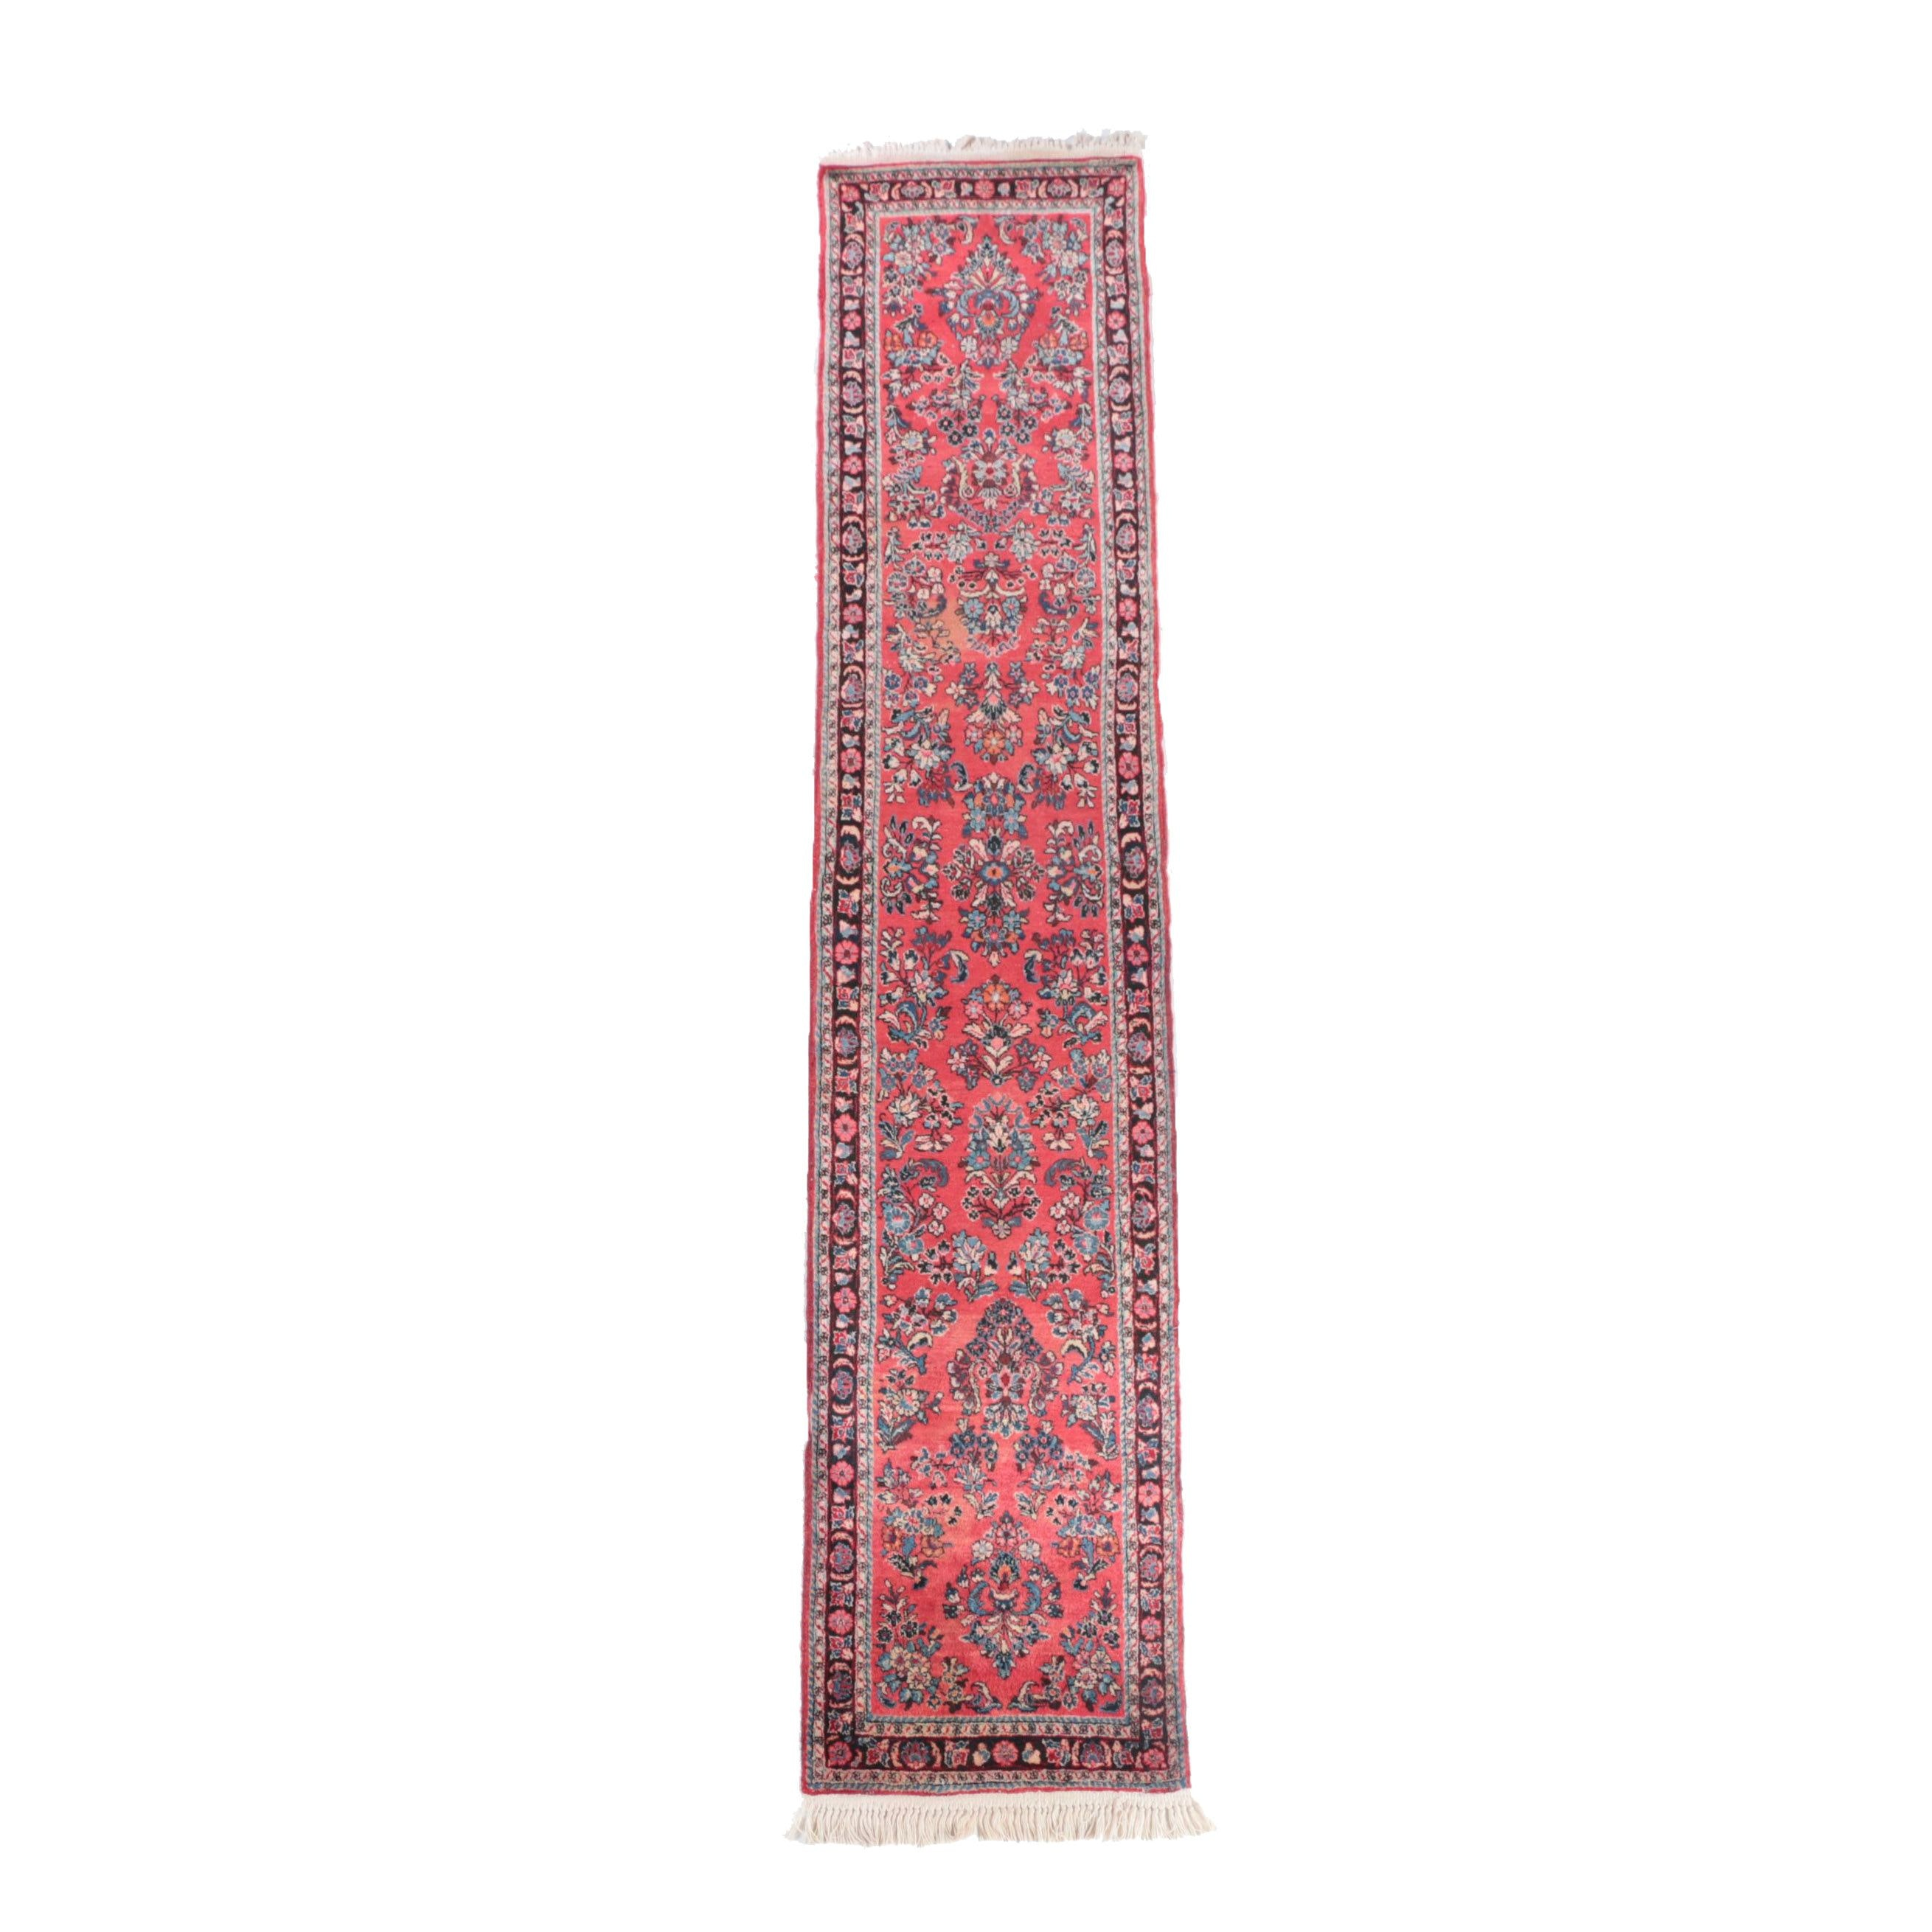 Hand-Knotted Persian Sarouk Wool Carpet Runner